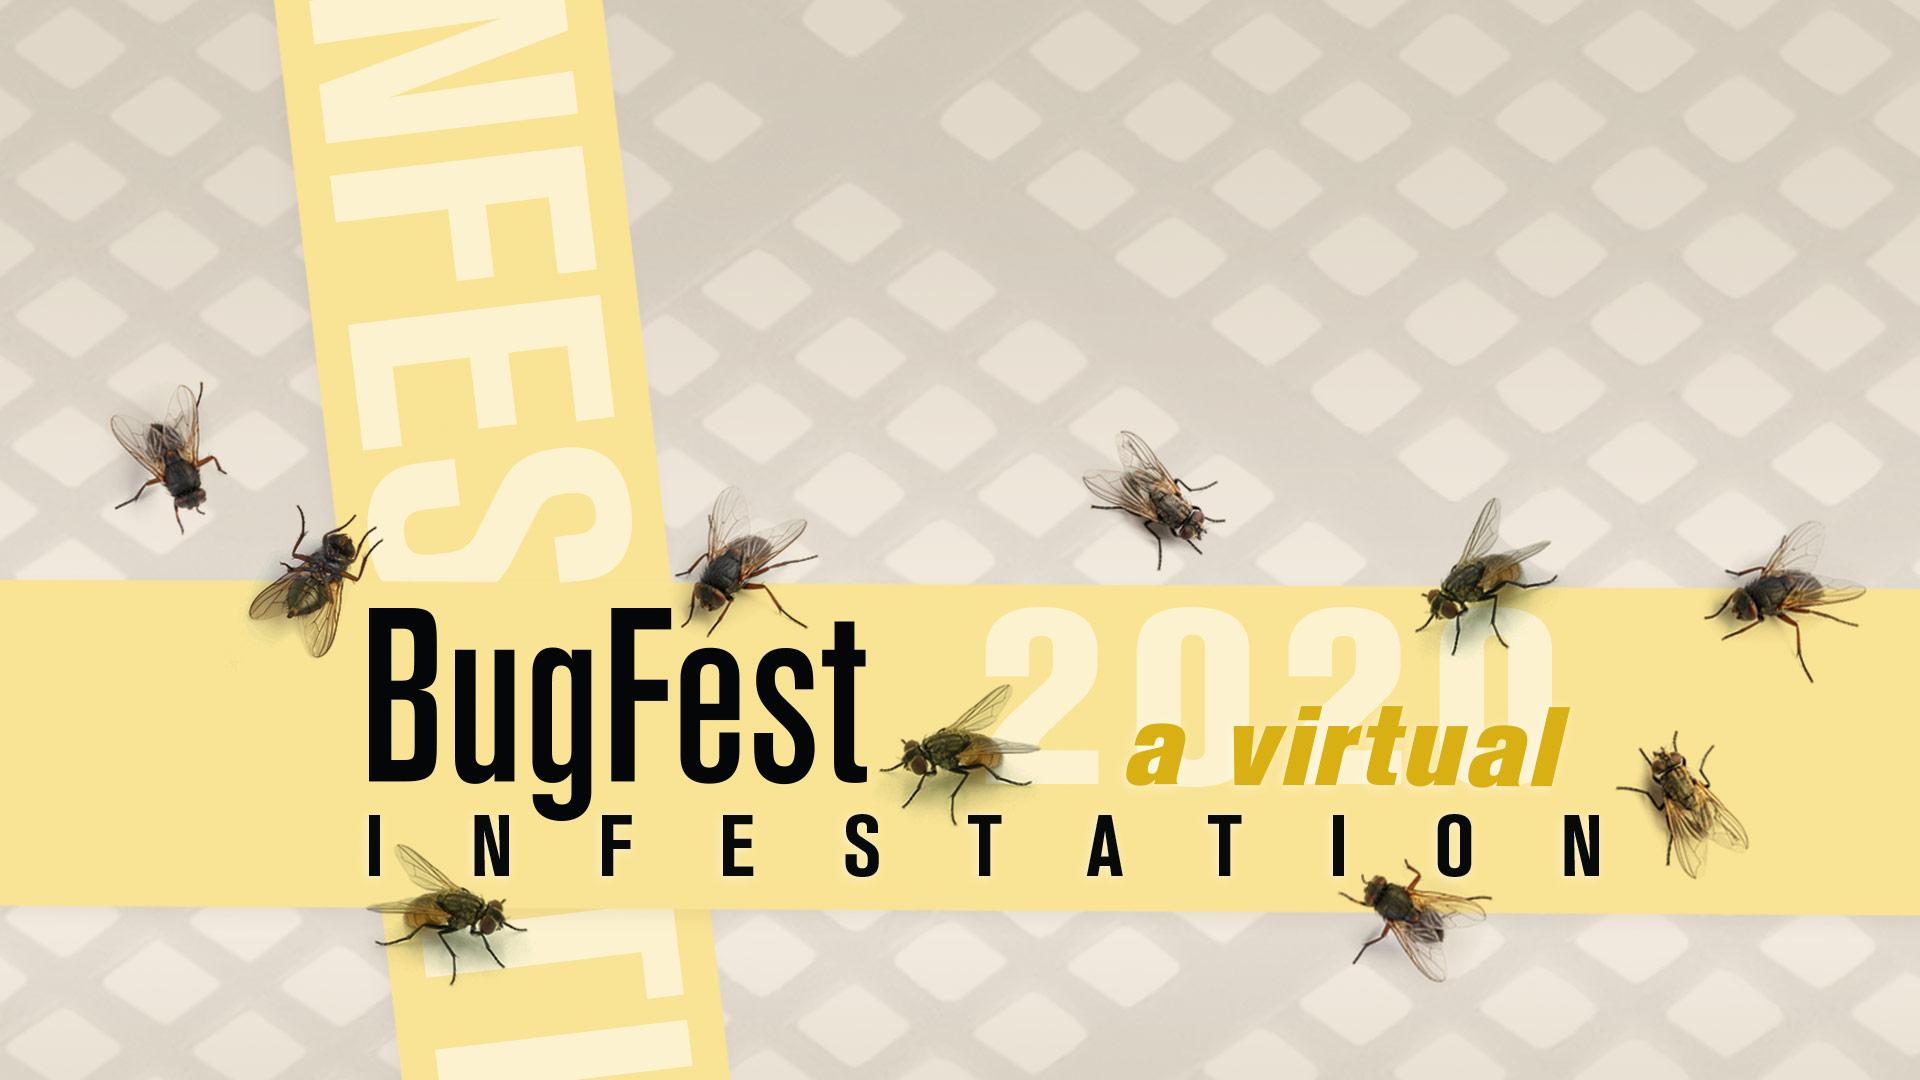 Bugfest 2020: A Virtual Infestation